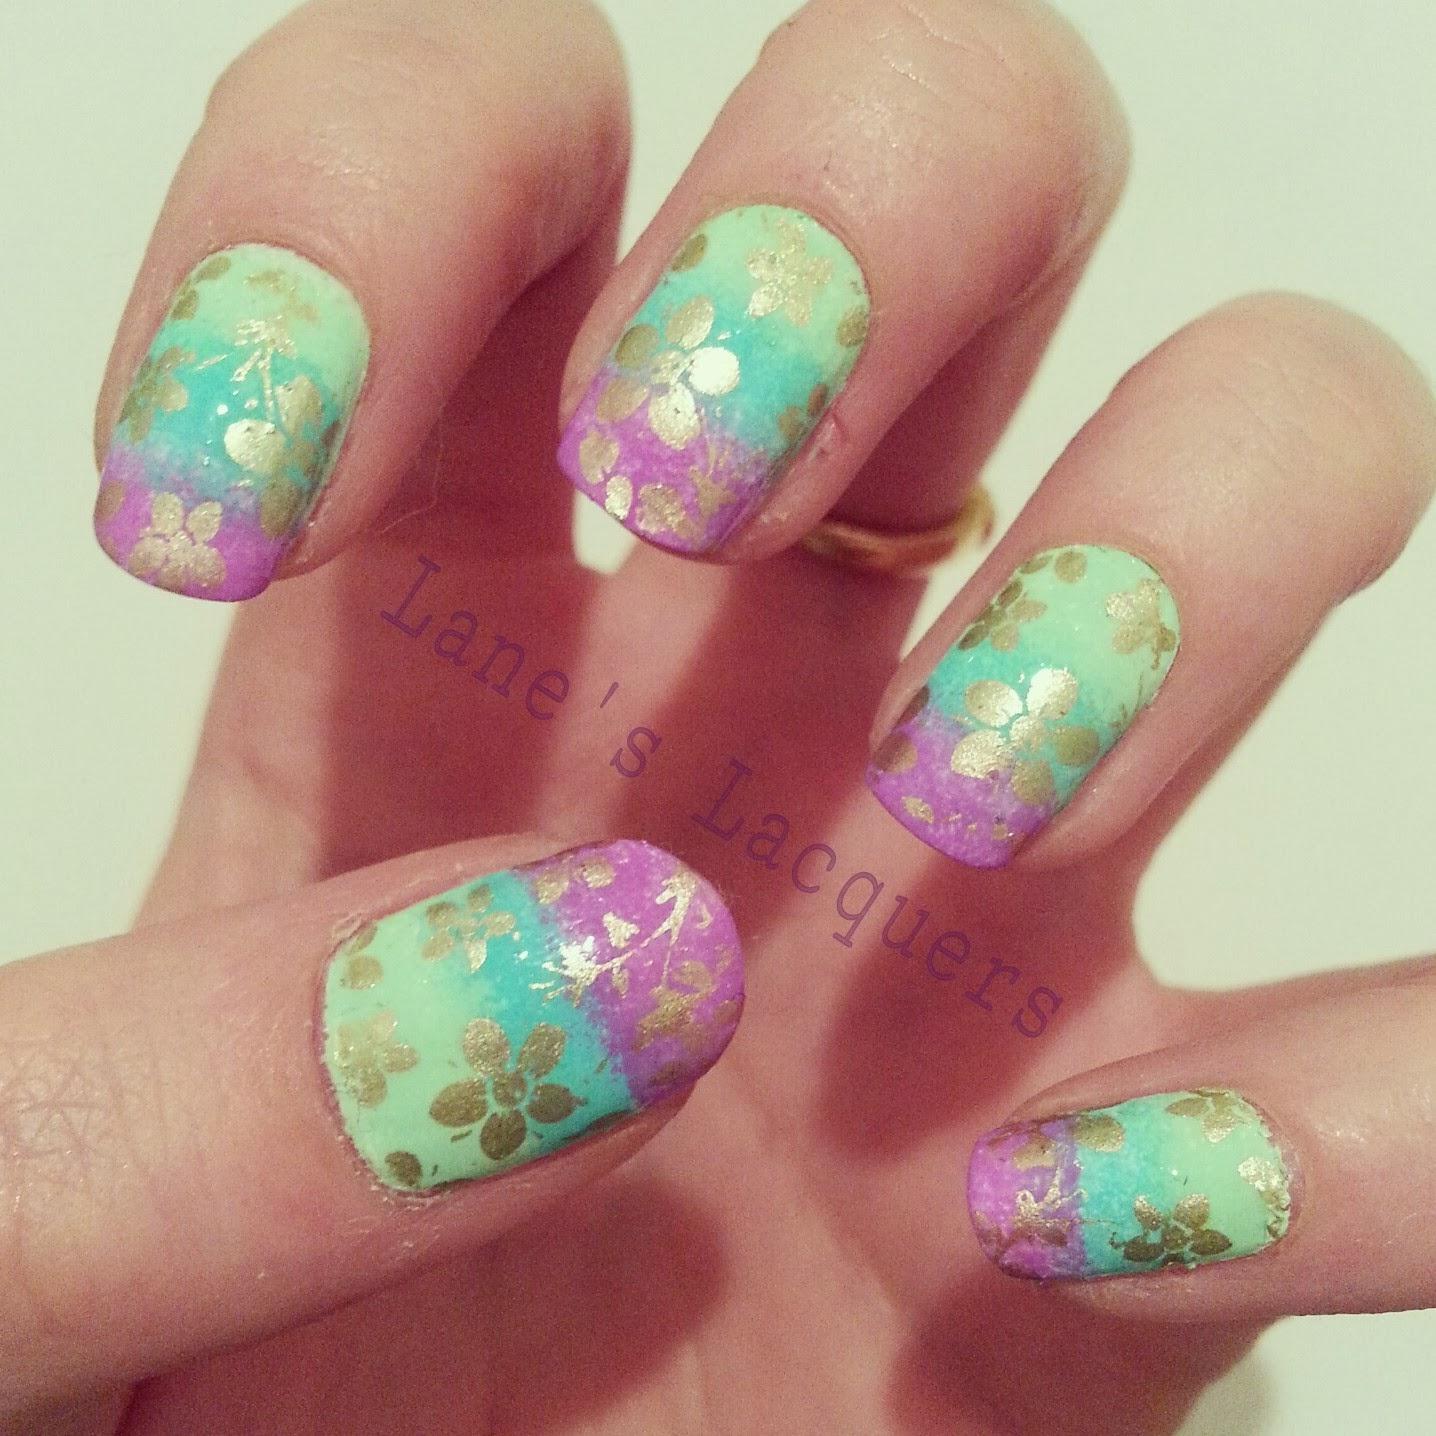 tri-polish-challenge-green-blue-purple-gradient-manicure